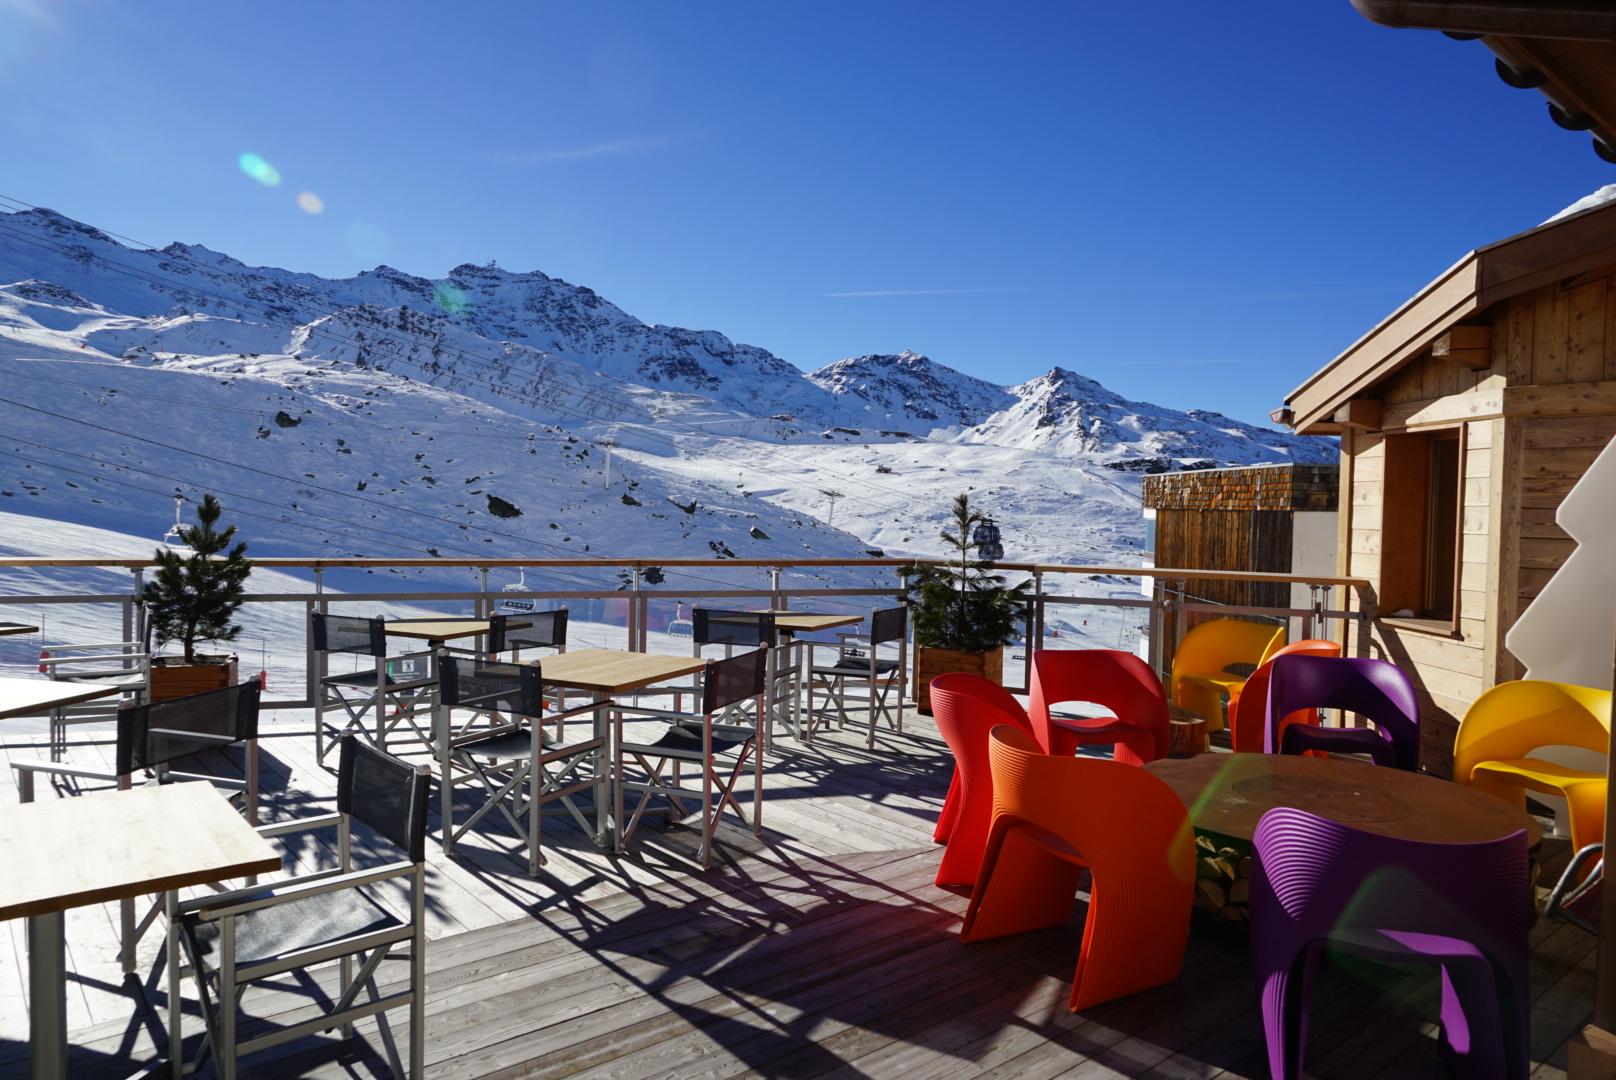 terrace, view, val thorens, pashmina, hotel, pashmina hotel, refuge, terrace, mountain, trip, holidays